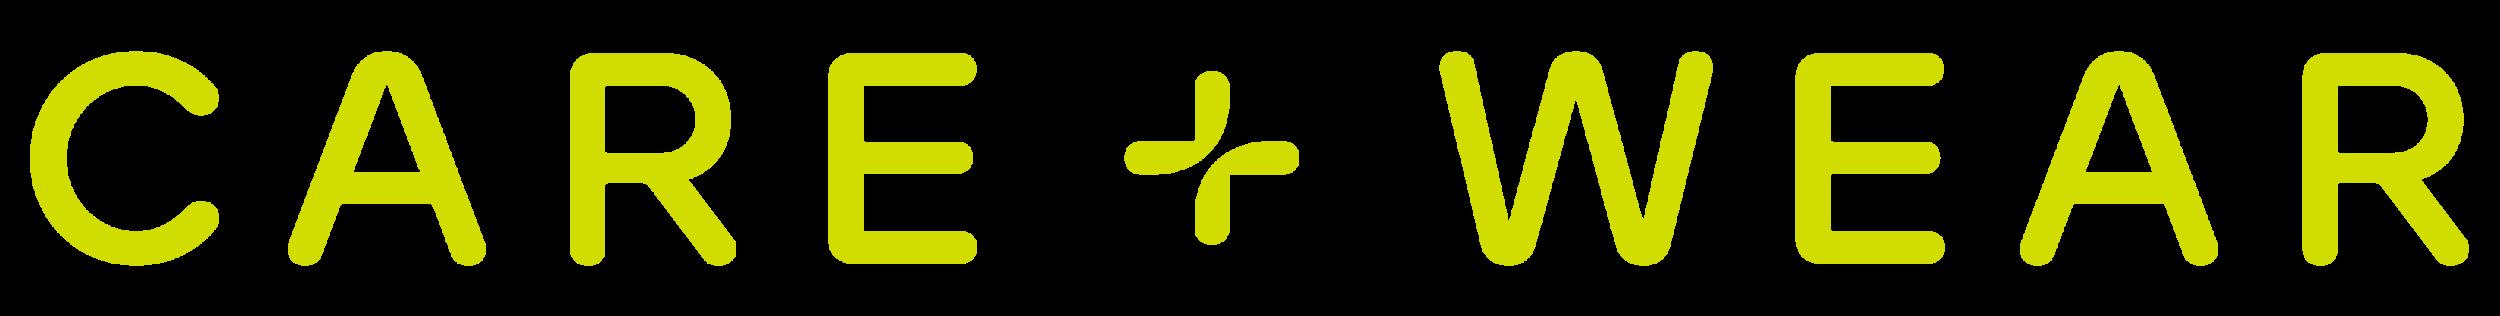 carewear logo.png